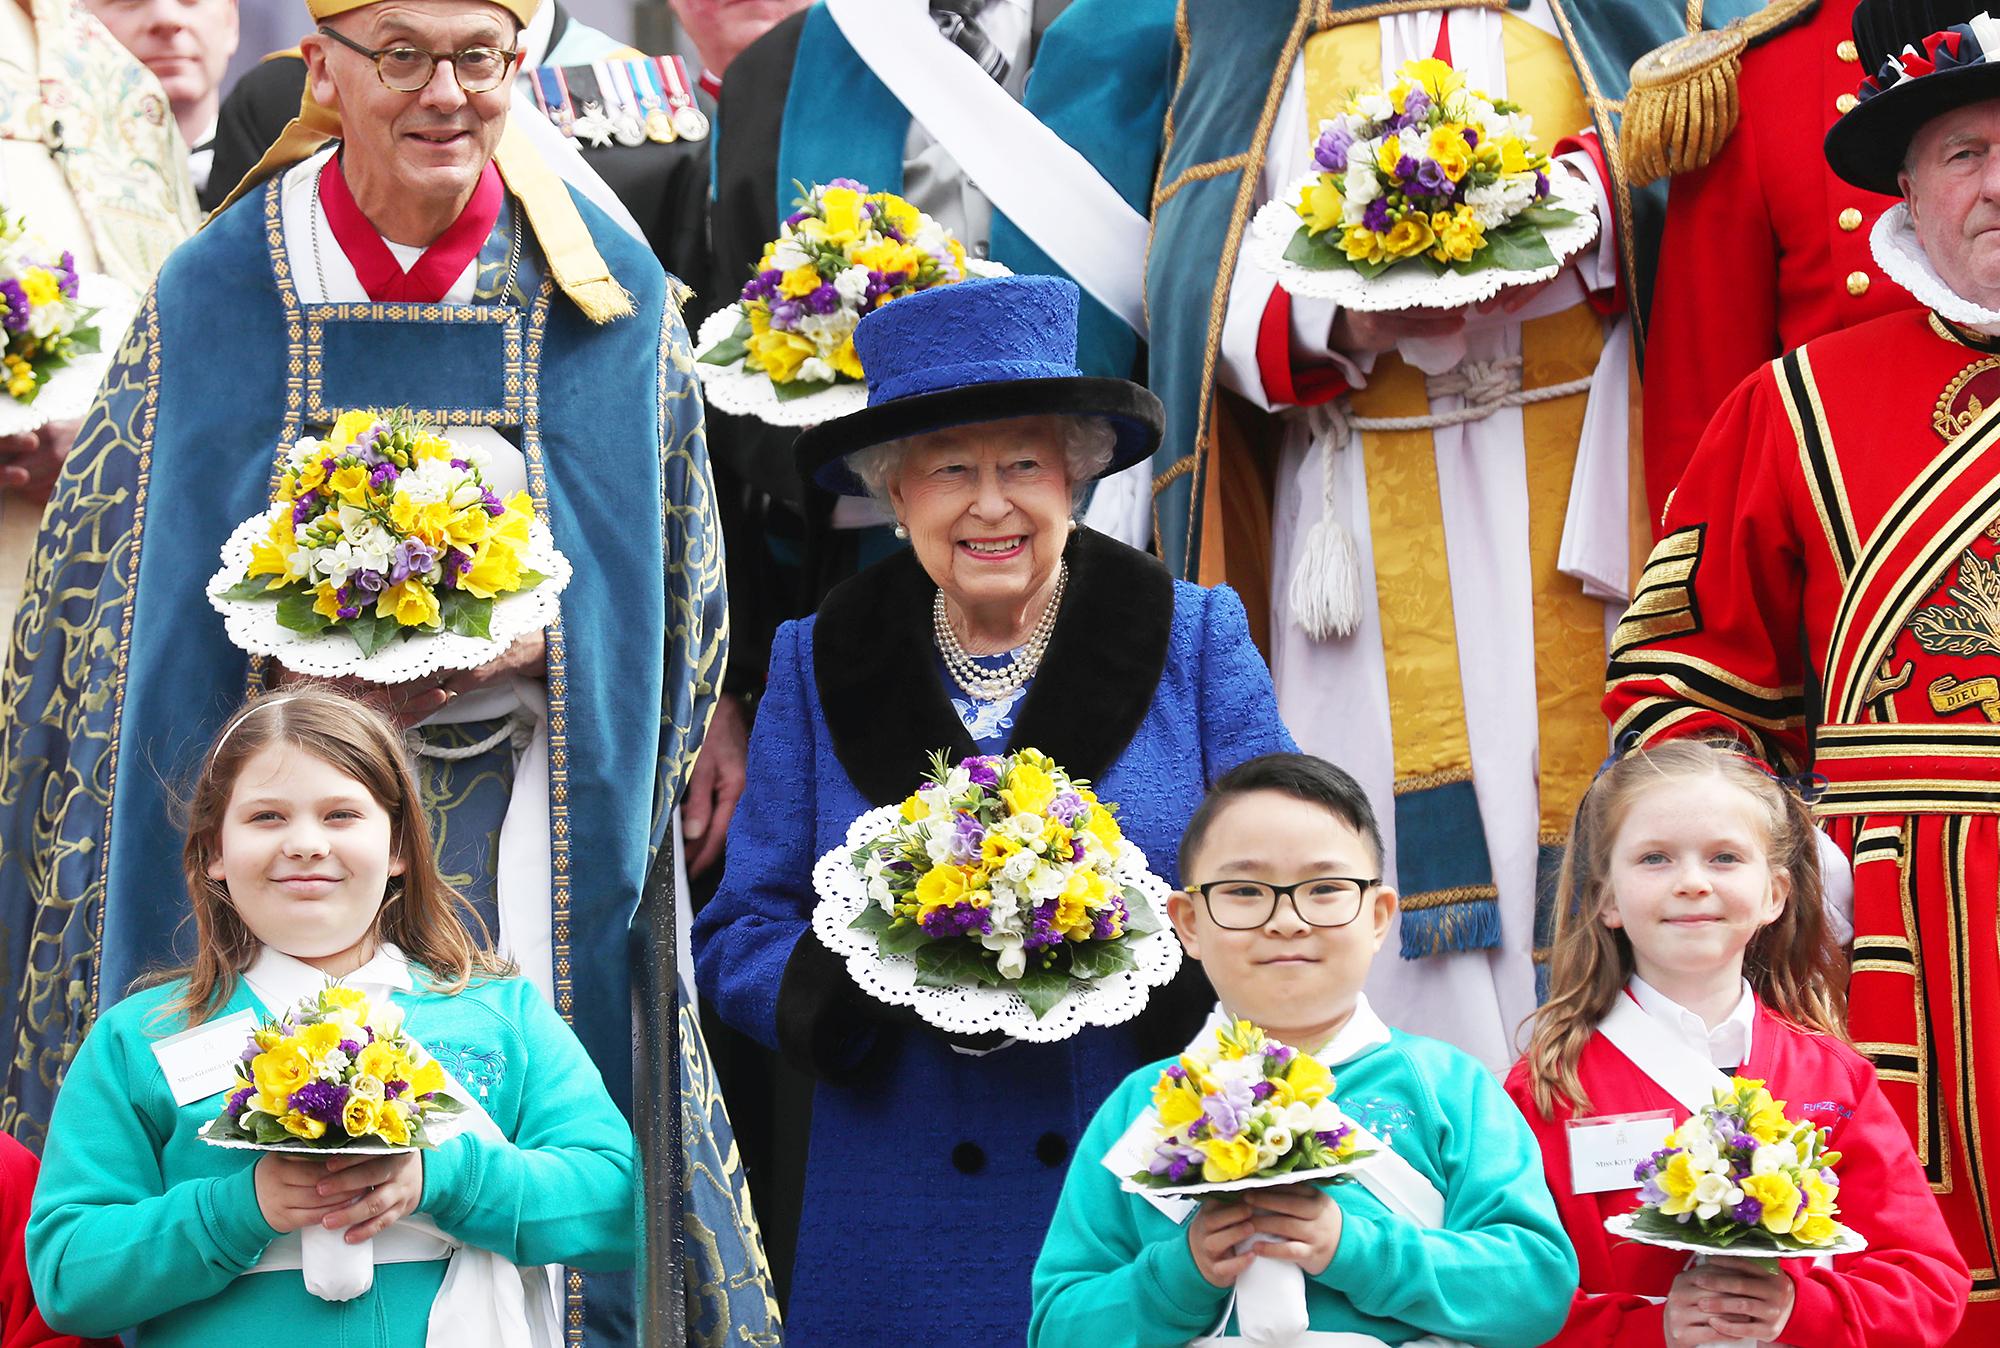 Queen Elizabeth II Royal Maundy service